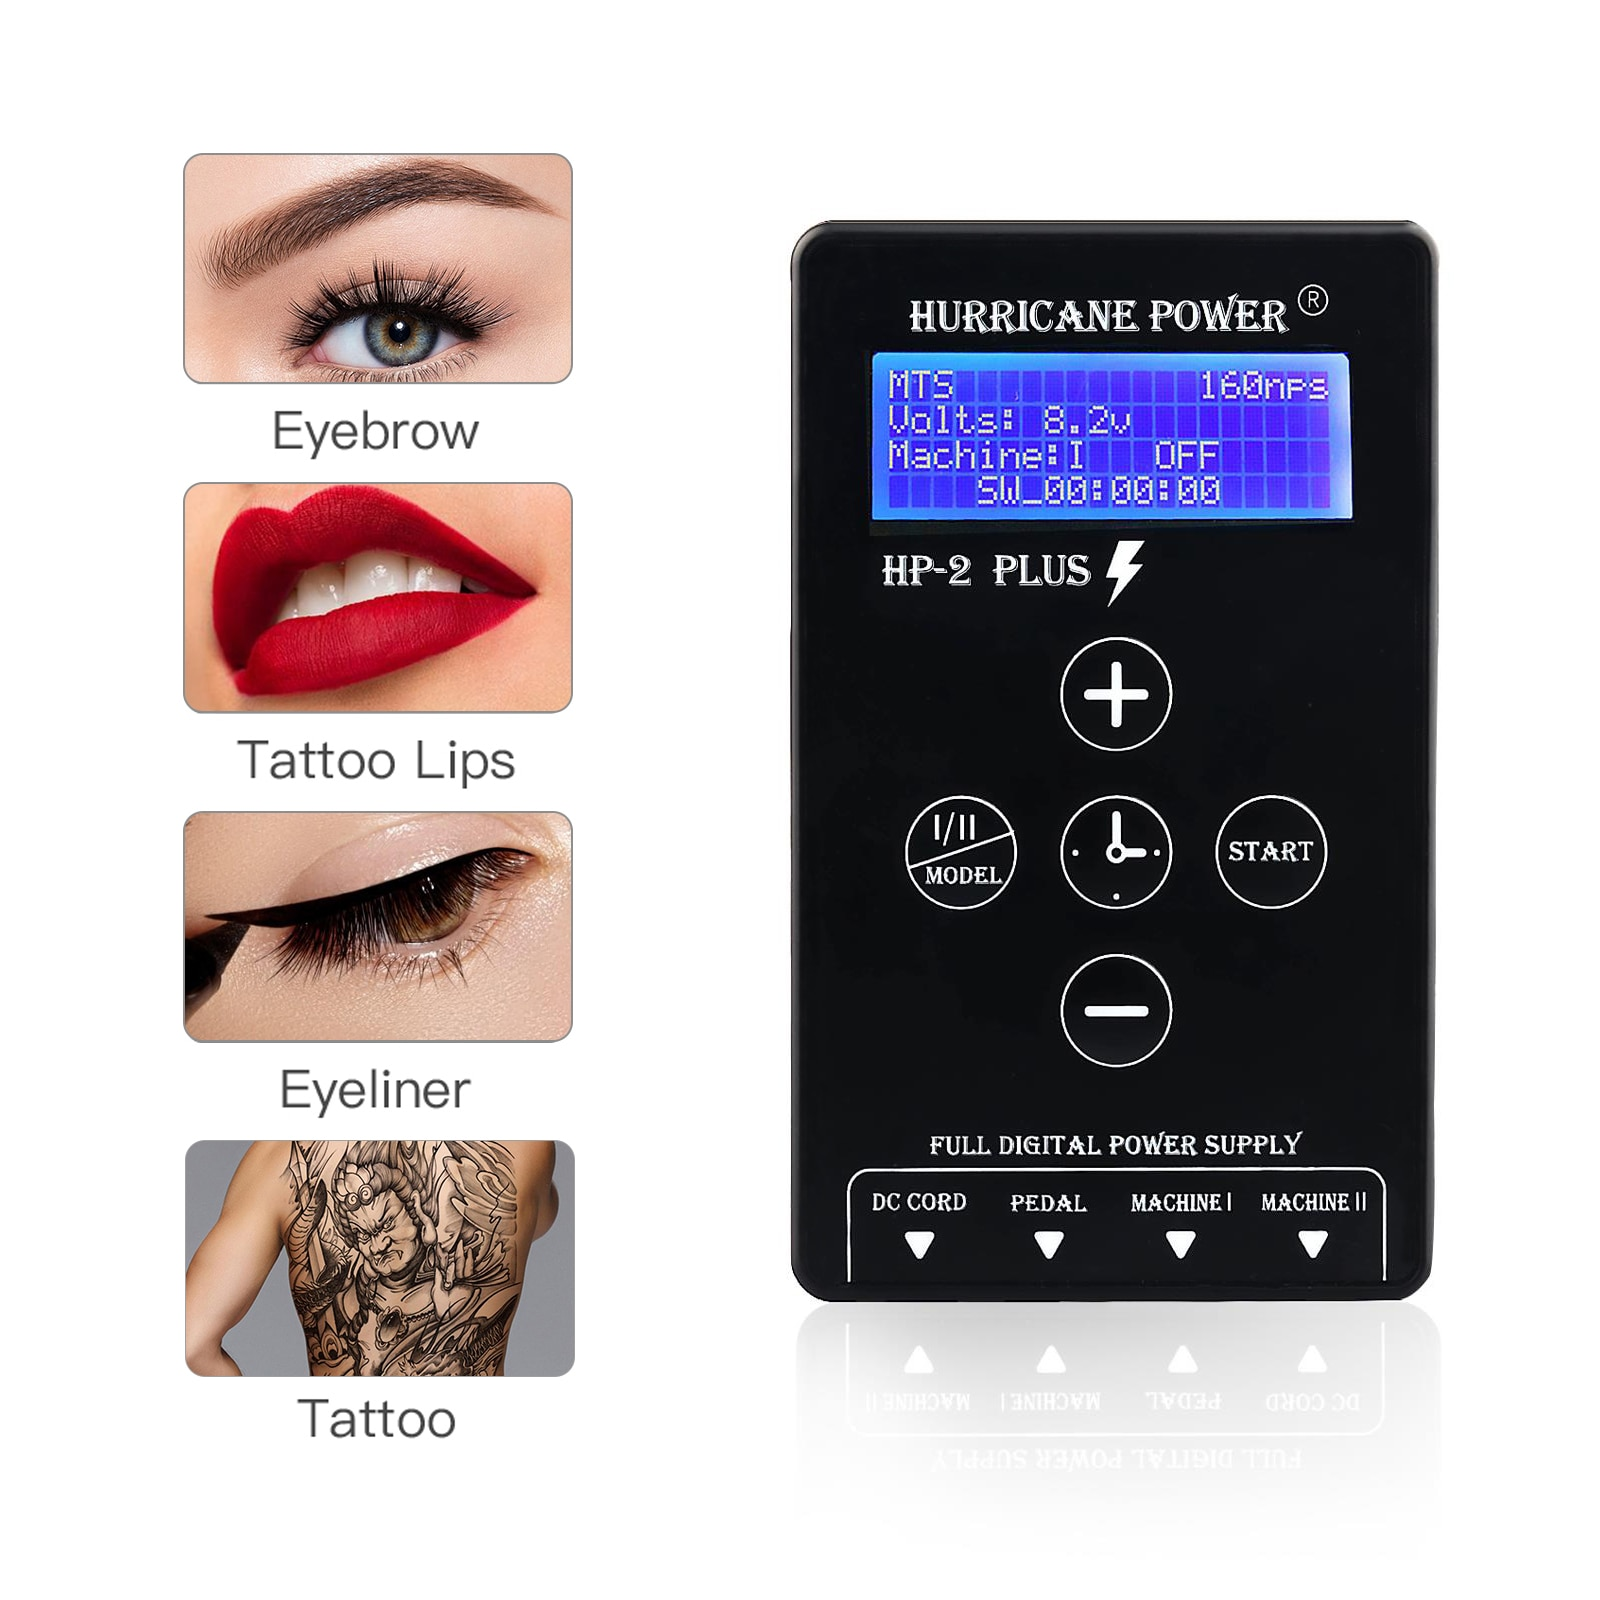 HP-2 Plus Digital LCD Tattoo Power Supply Hurricane Rotary Tattoo Machine Tattoo Supplies Permarent Makeup Tattoo Power Supply mini tattoo digital power supply with knob to adjust voltage 2 tattoo foot pedal mode black tattoo power supply with led lights